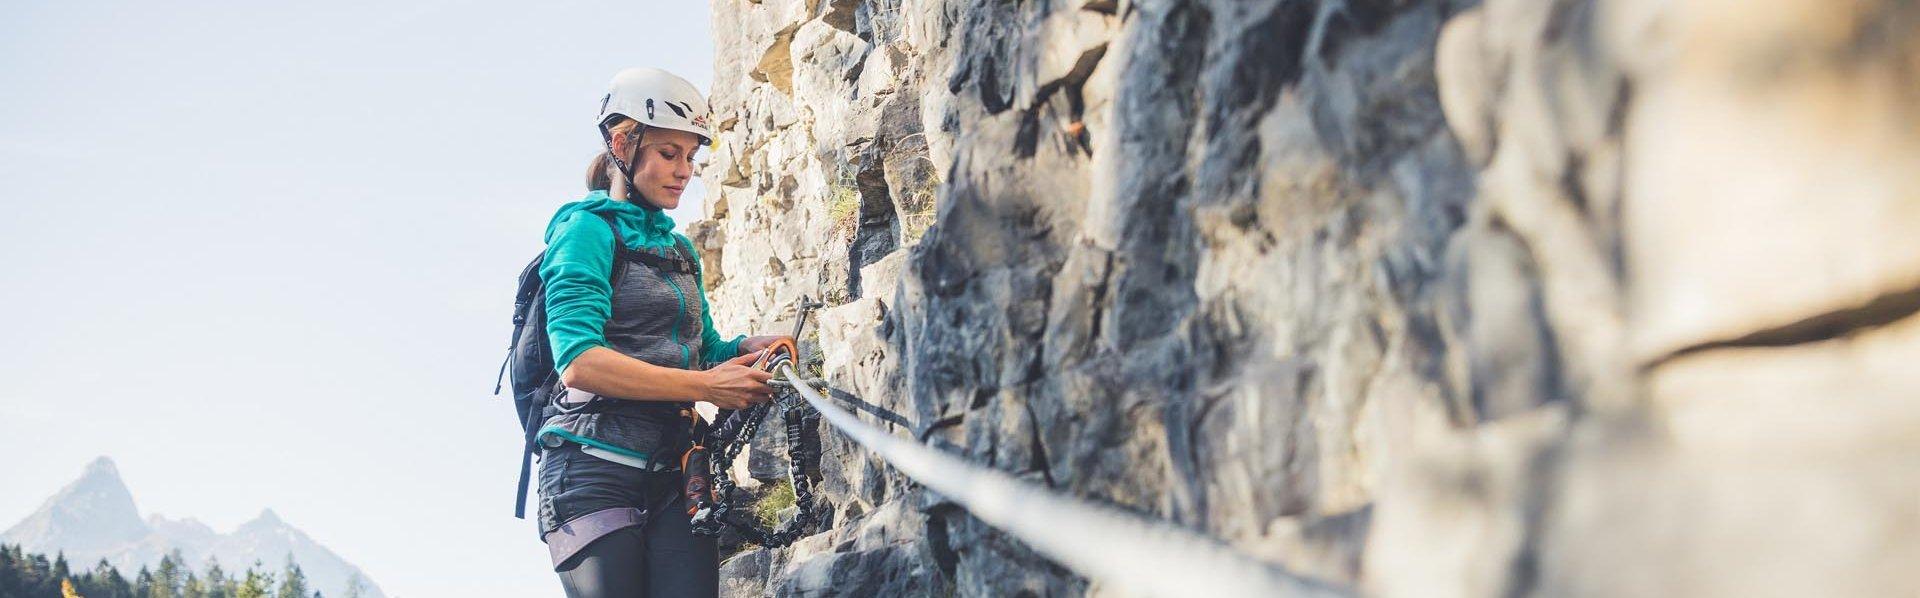 Frau am Klettersteig